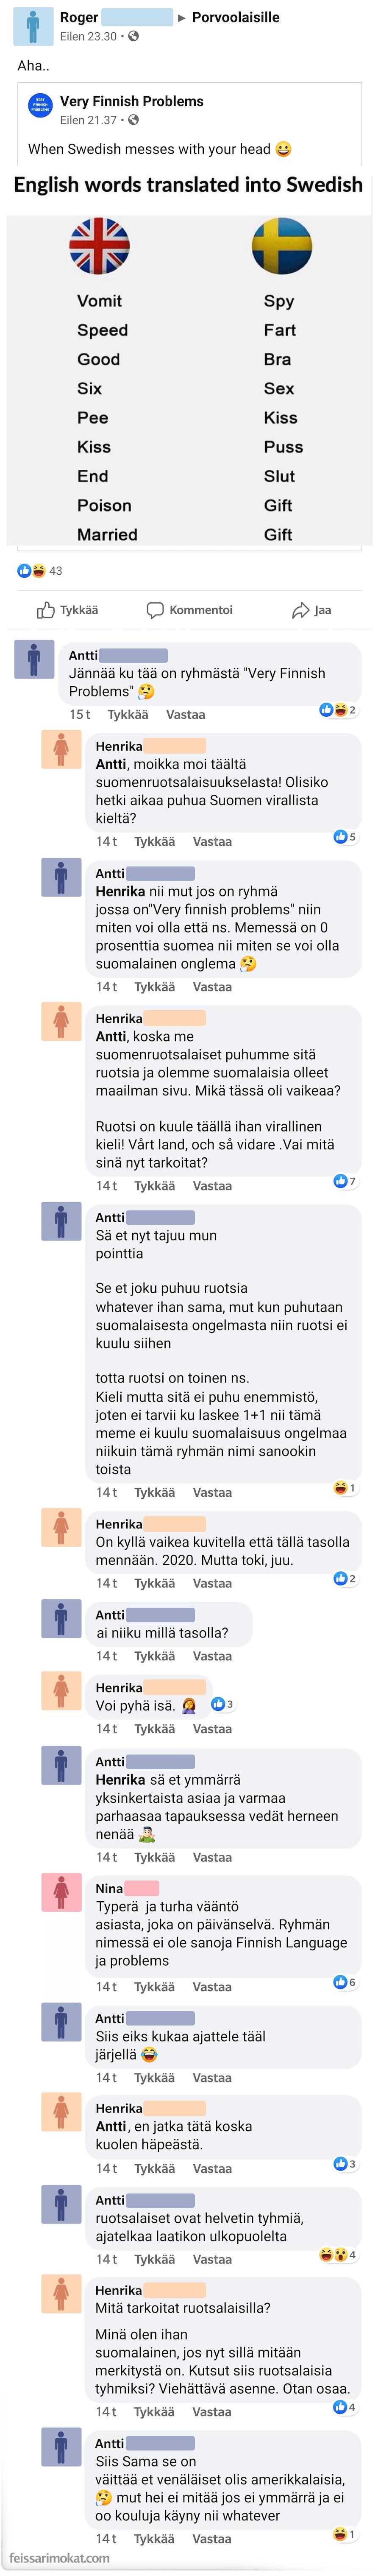 Suomalaiset ongelmat